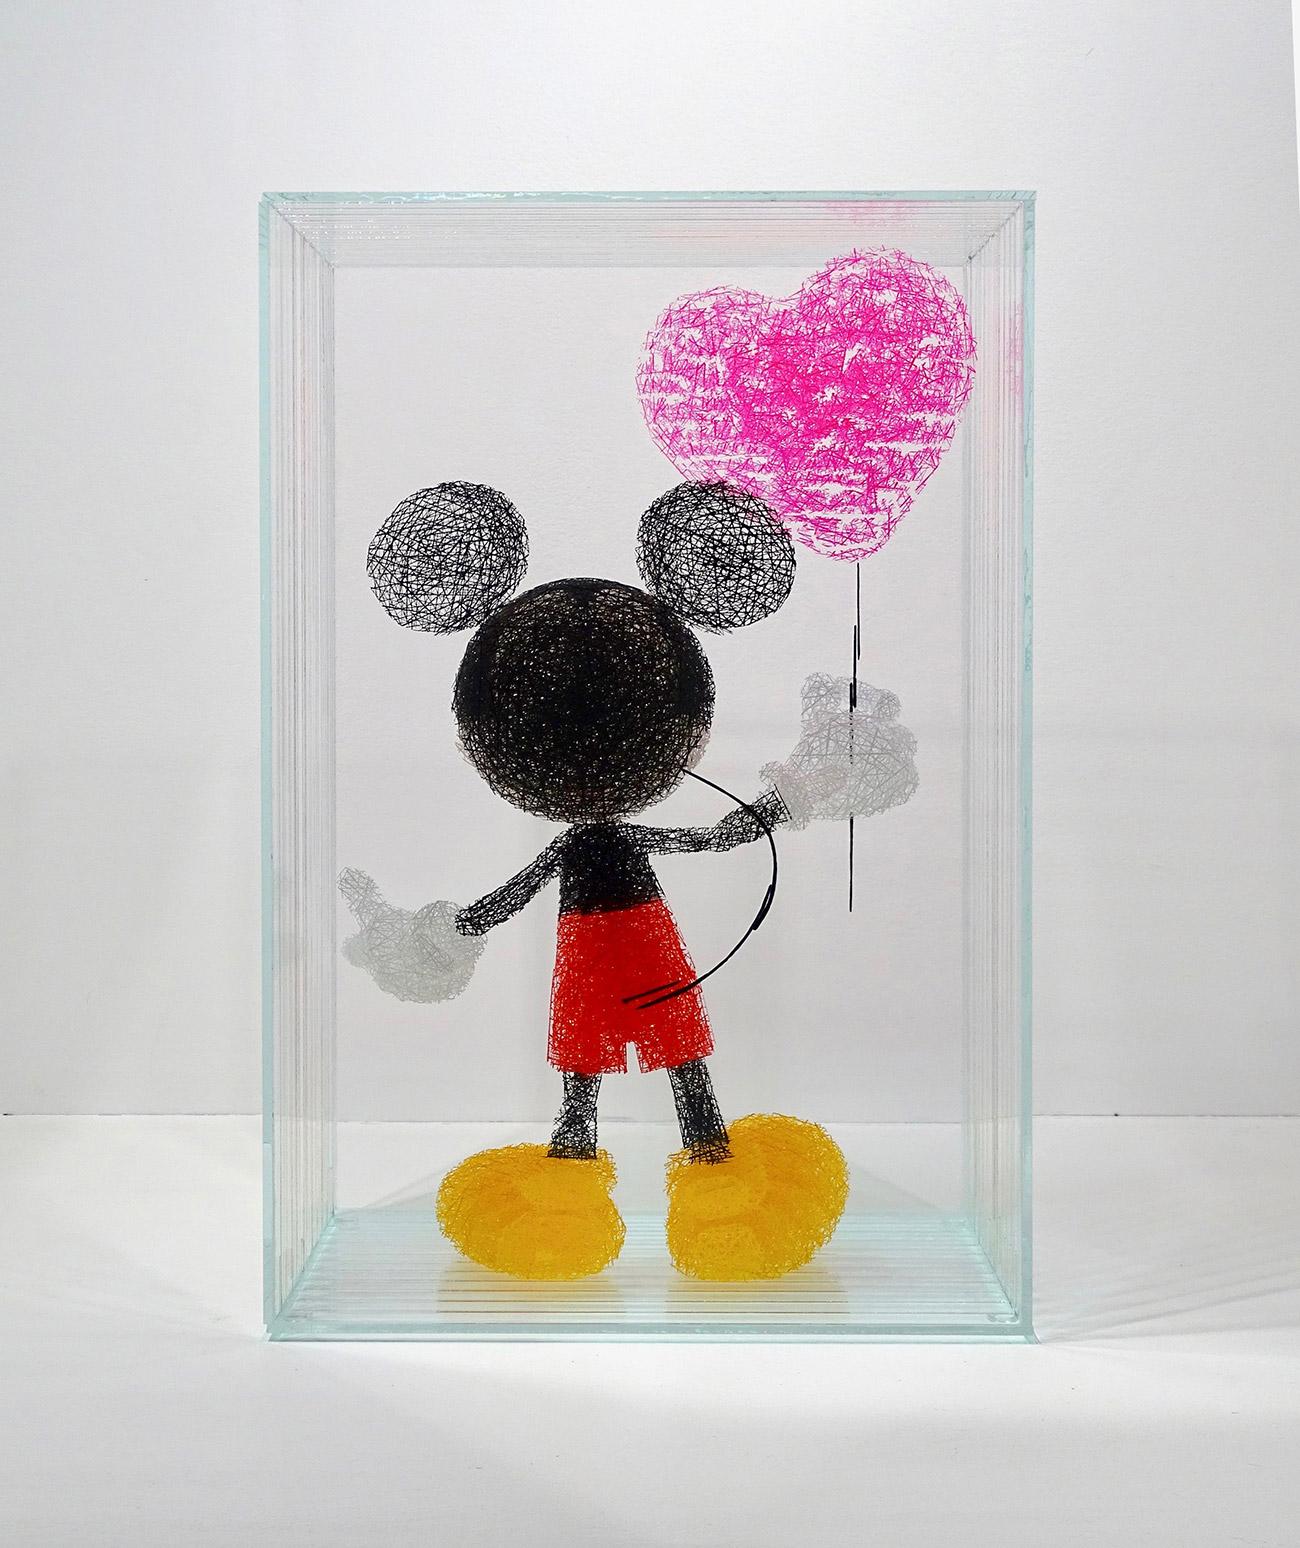 2-sebastien-creteur-American-Love-b-galerie-bettina-art-contemporain-paris.jpg